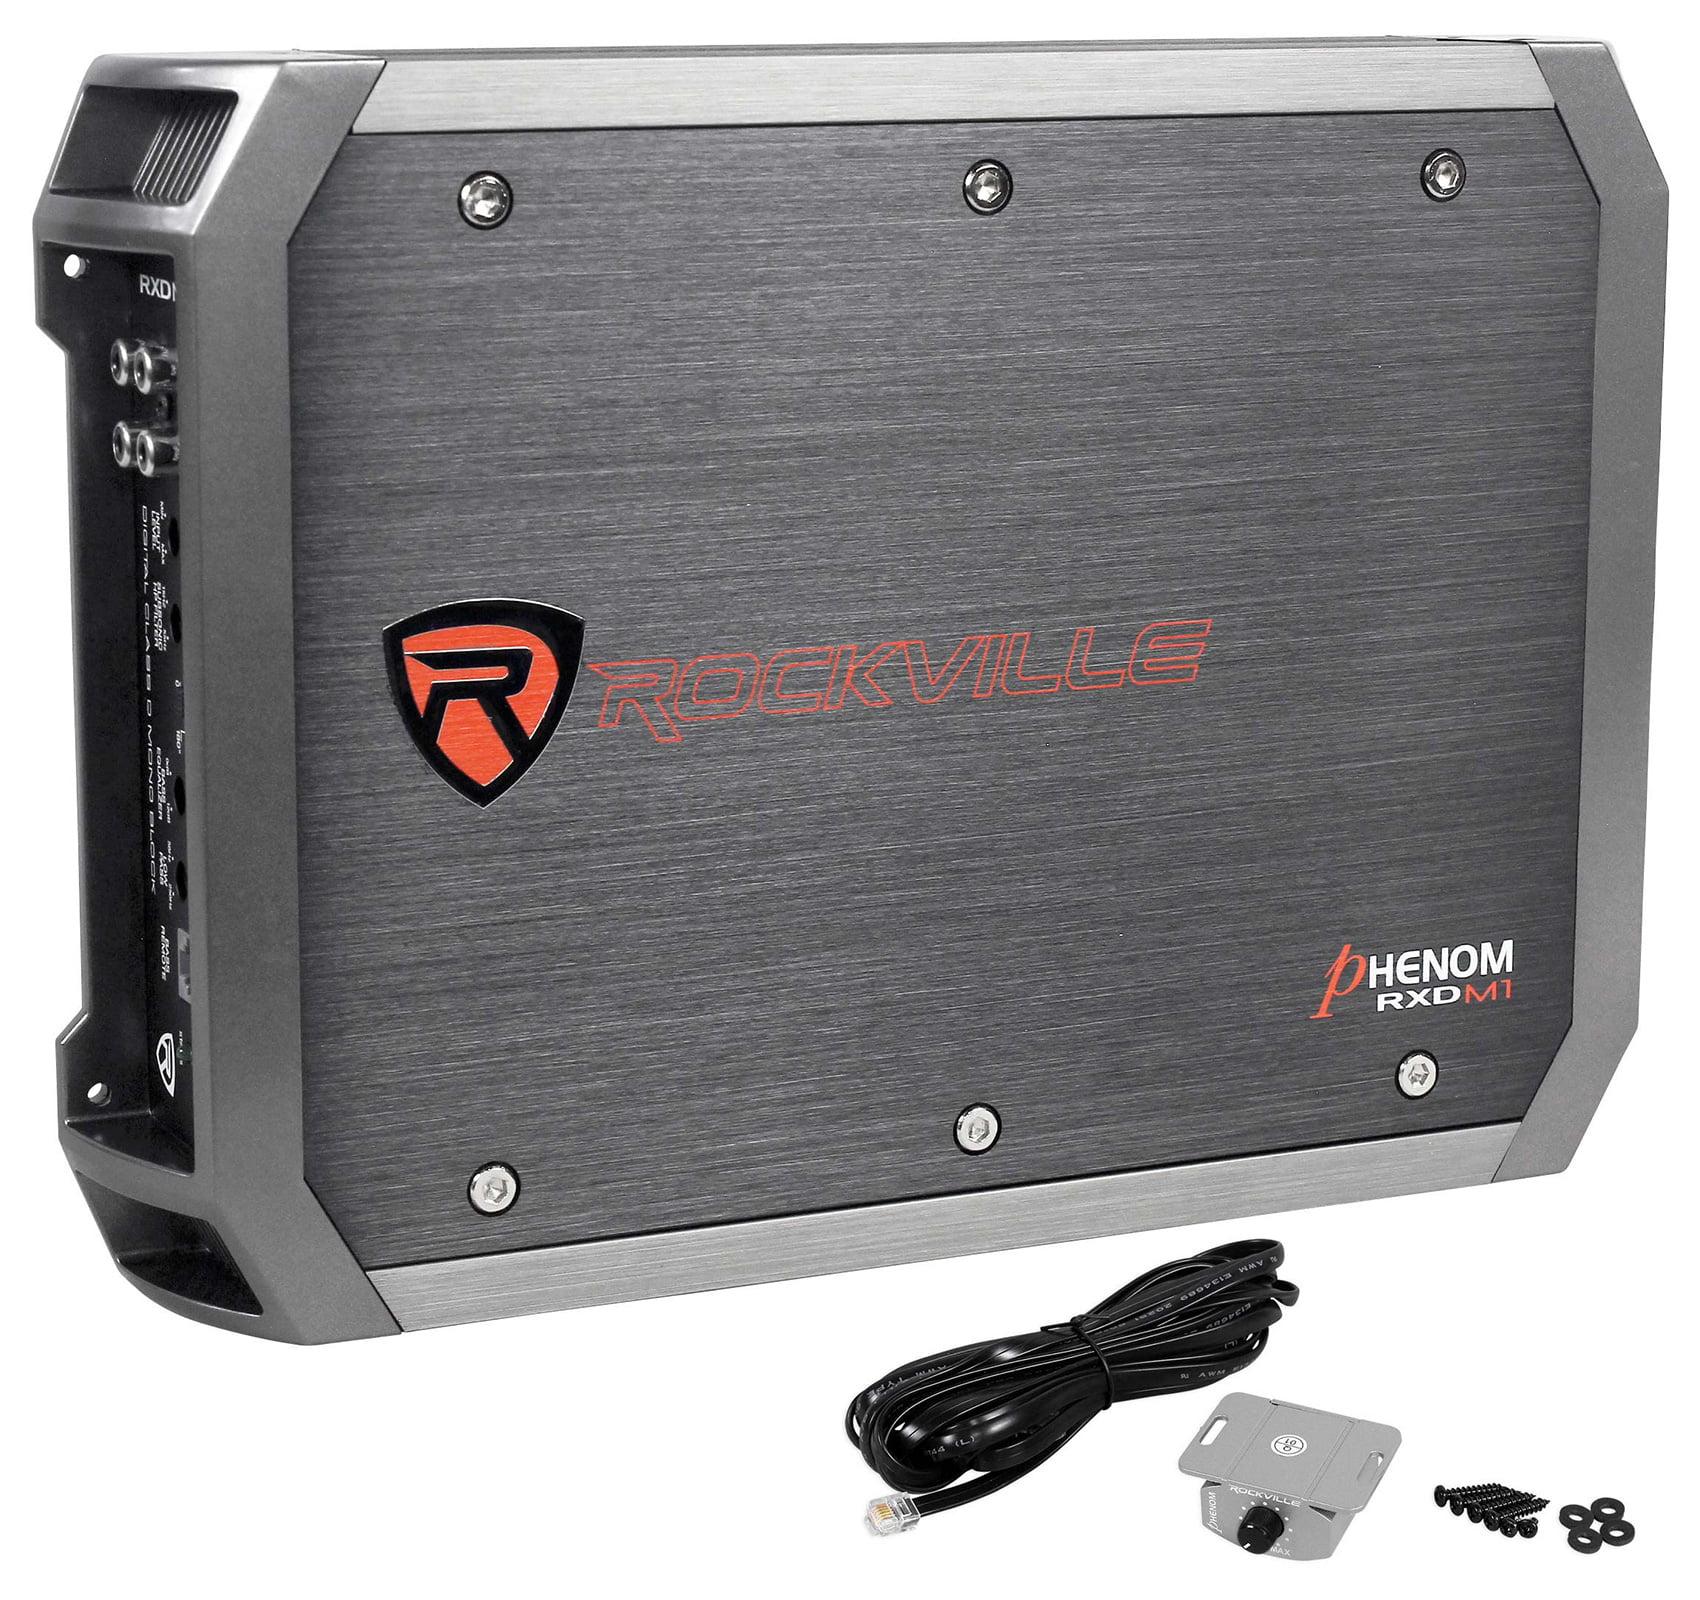 "Rockville 1000w Mono Amplifier For (1) Kicker 43CWRT102 COMPRT10 10"" Subwoofer"